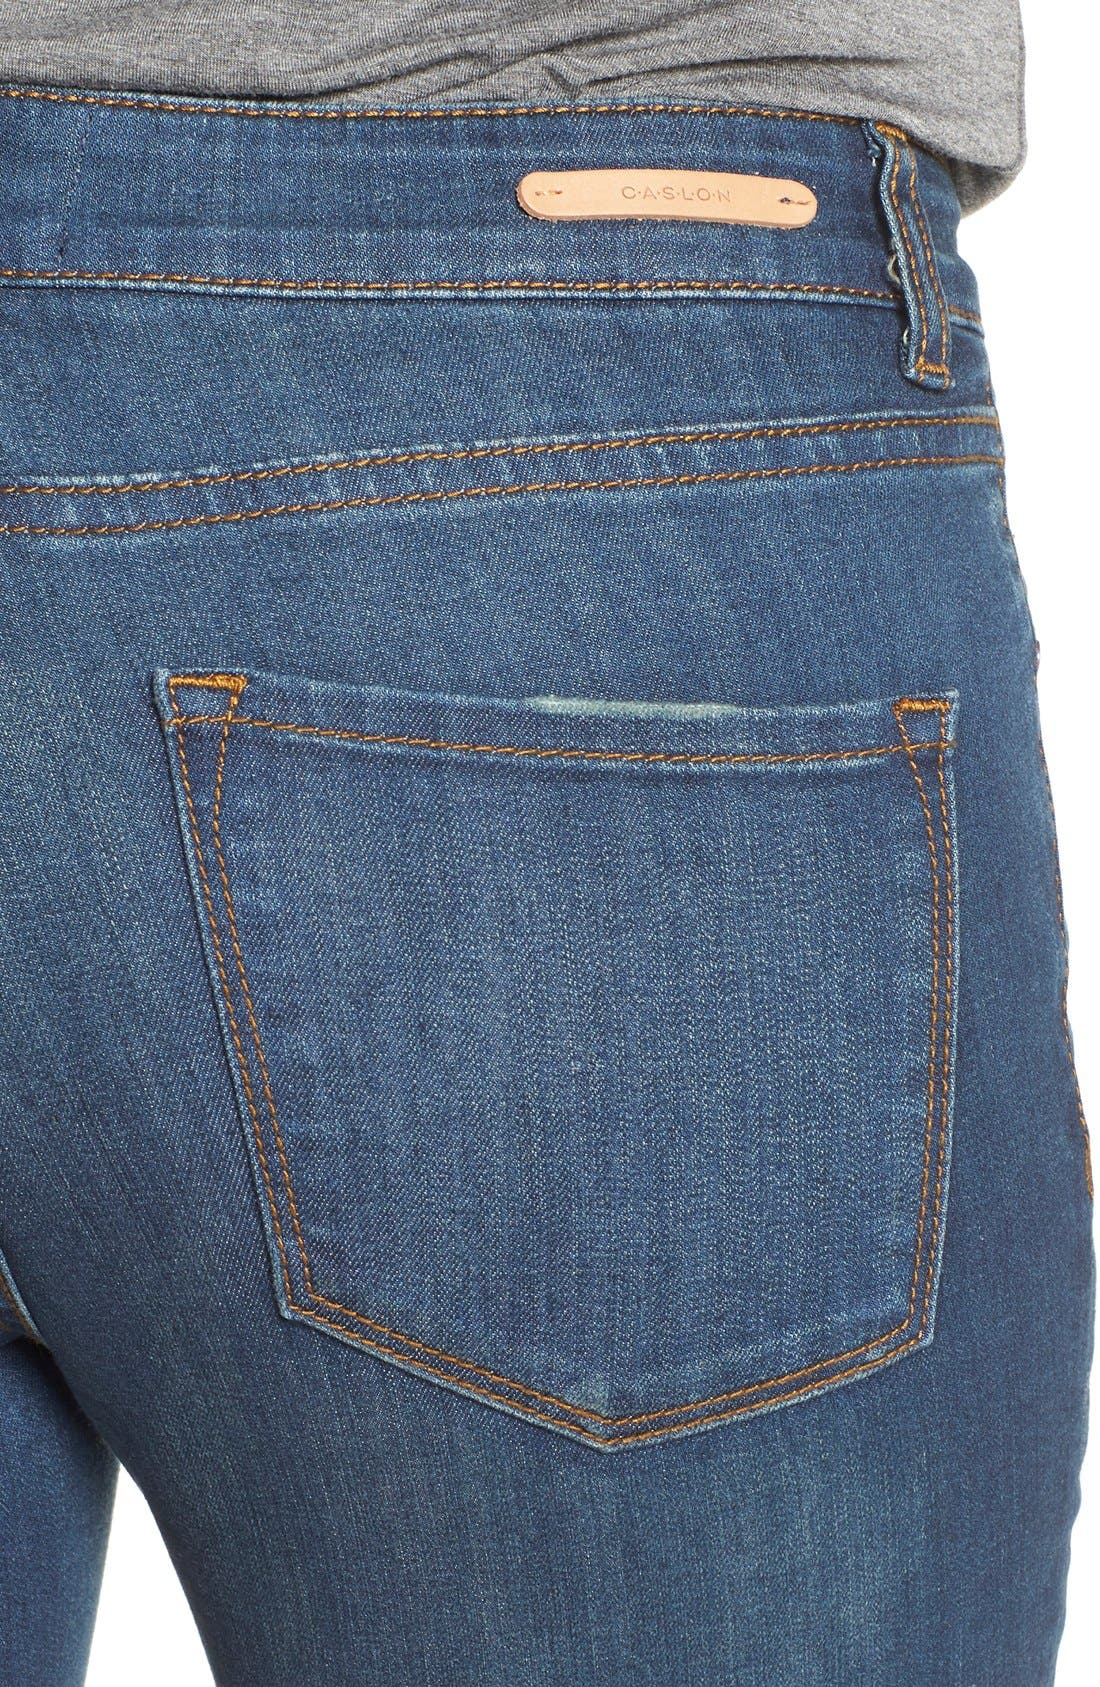 Alternate Image 4  - Caslon® Stretch Skinny Ankle Jeans (Midnight) (Regular & Petite)